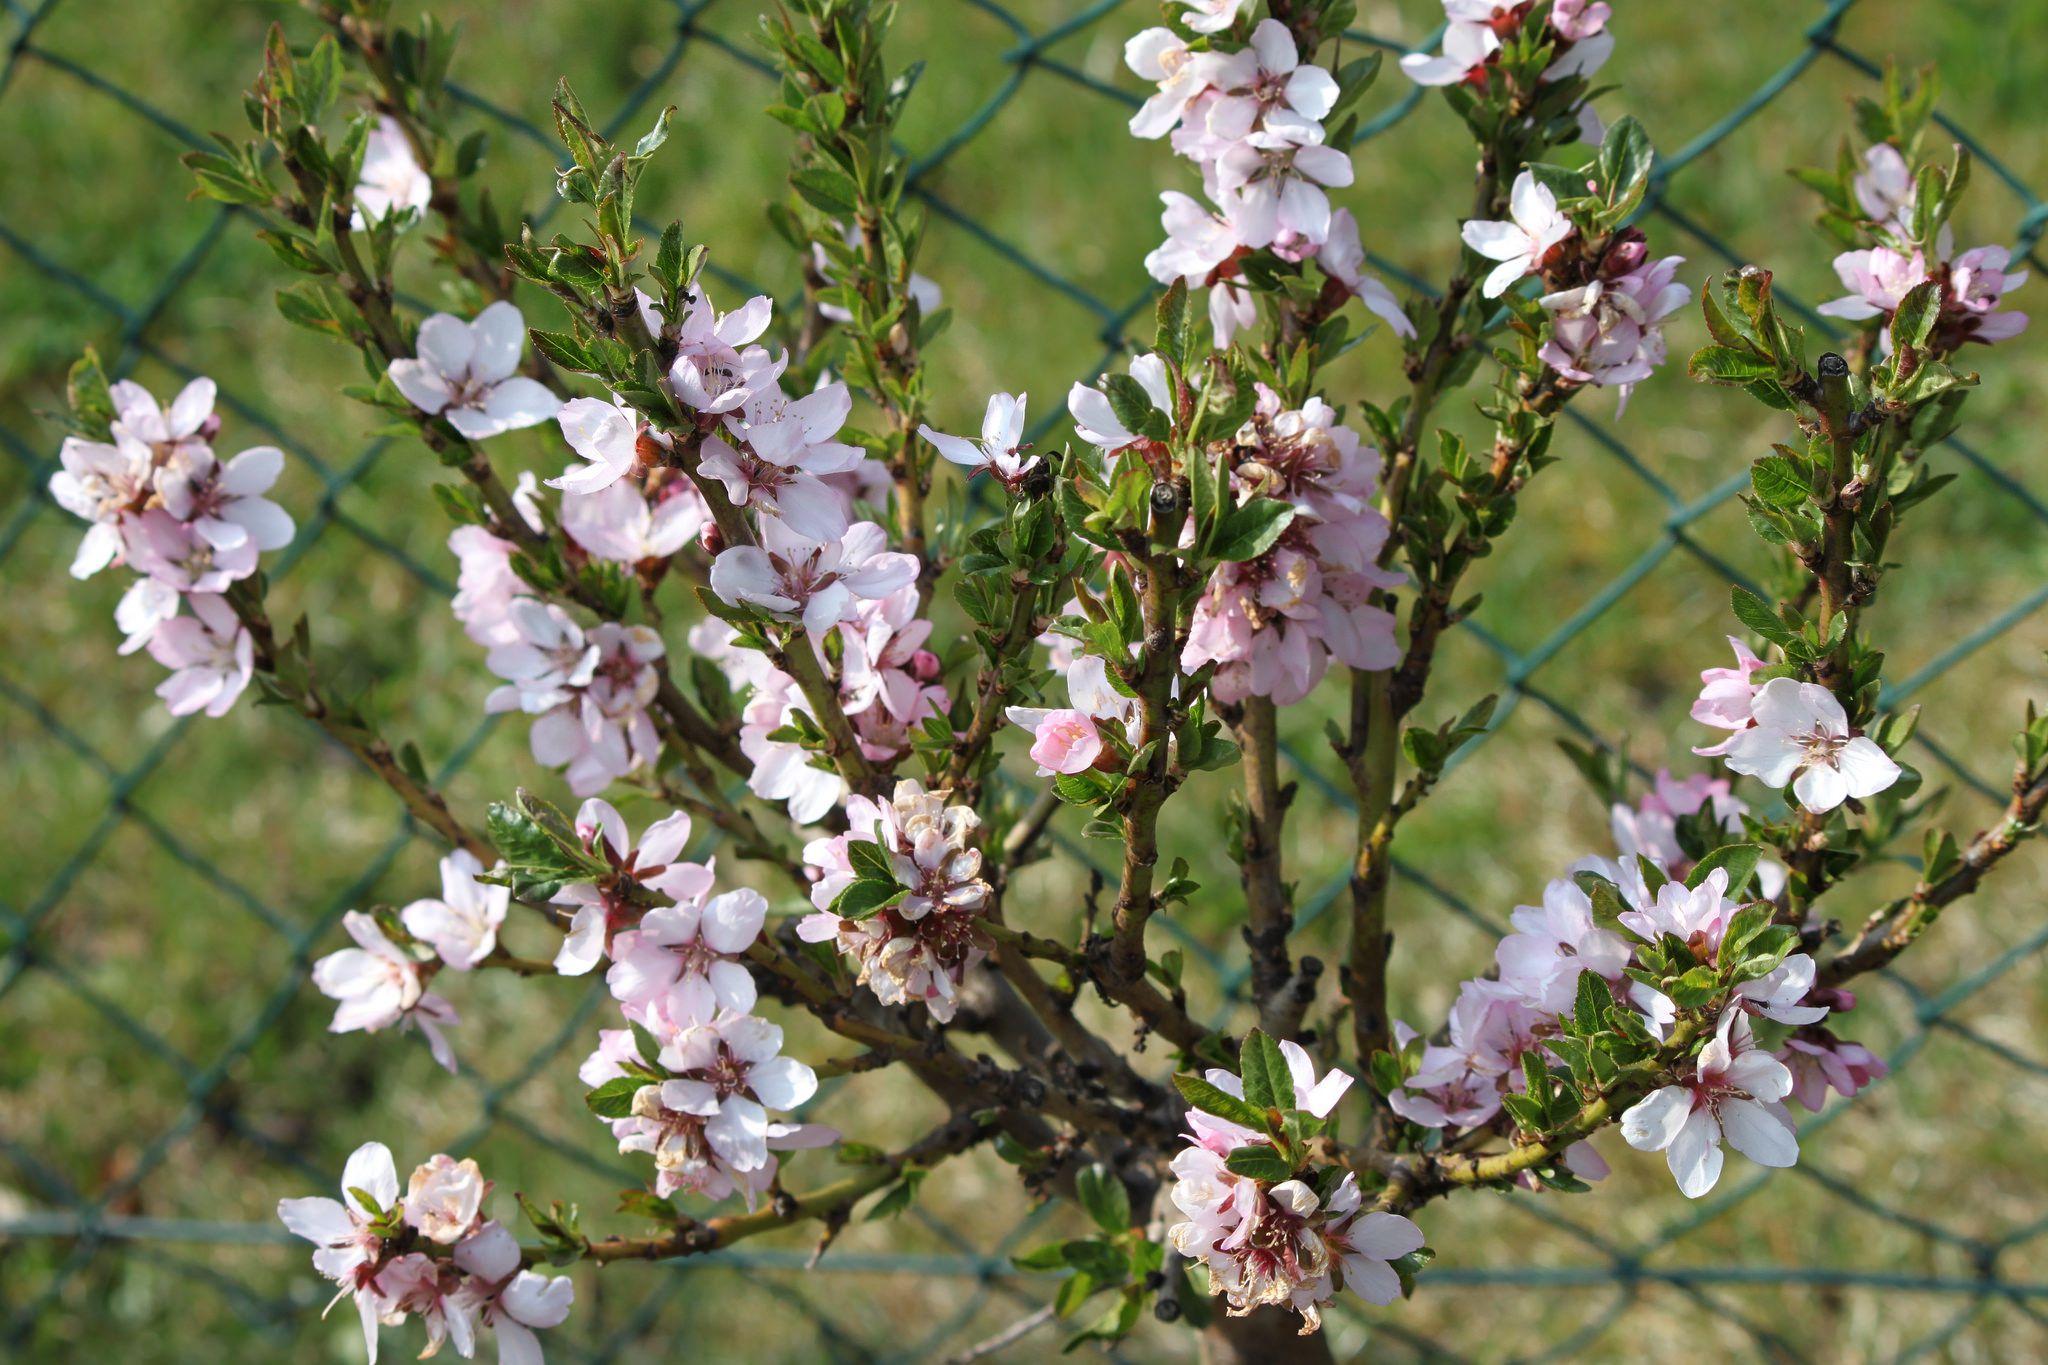 Dwarf Flowering Almond Bush Has Giant Impact in Spring